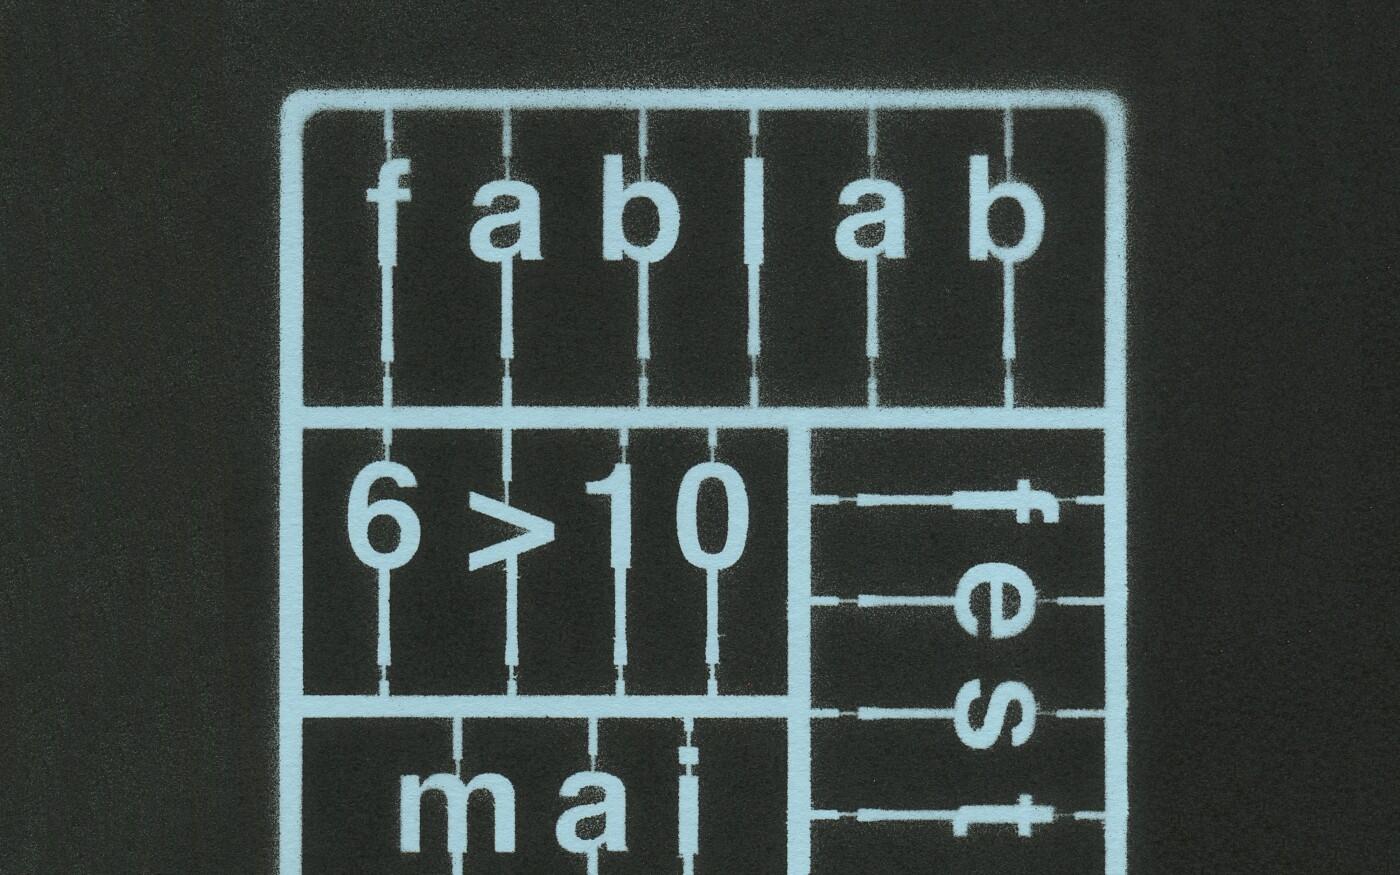 Atelier Fablab Festival